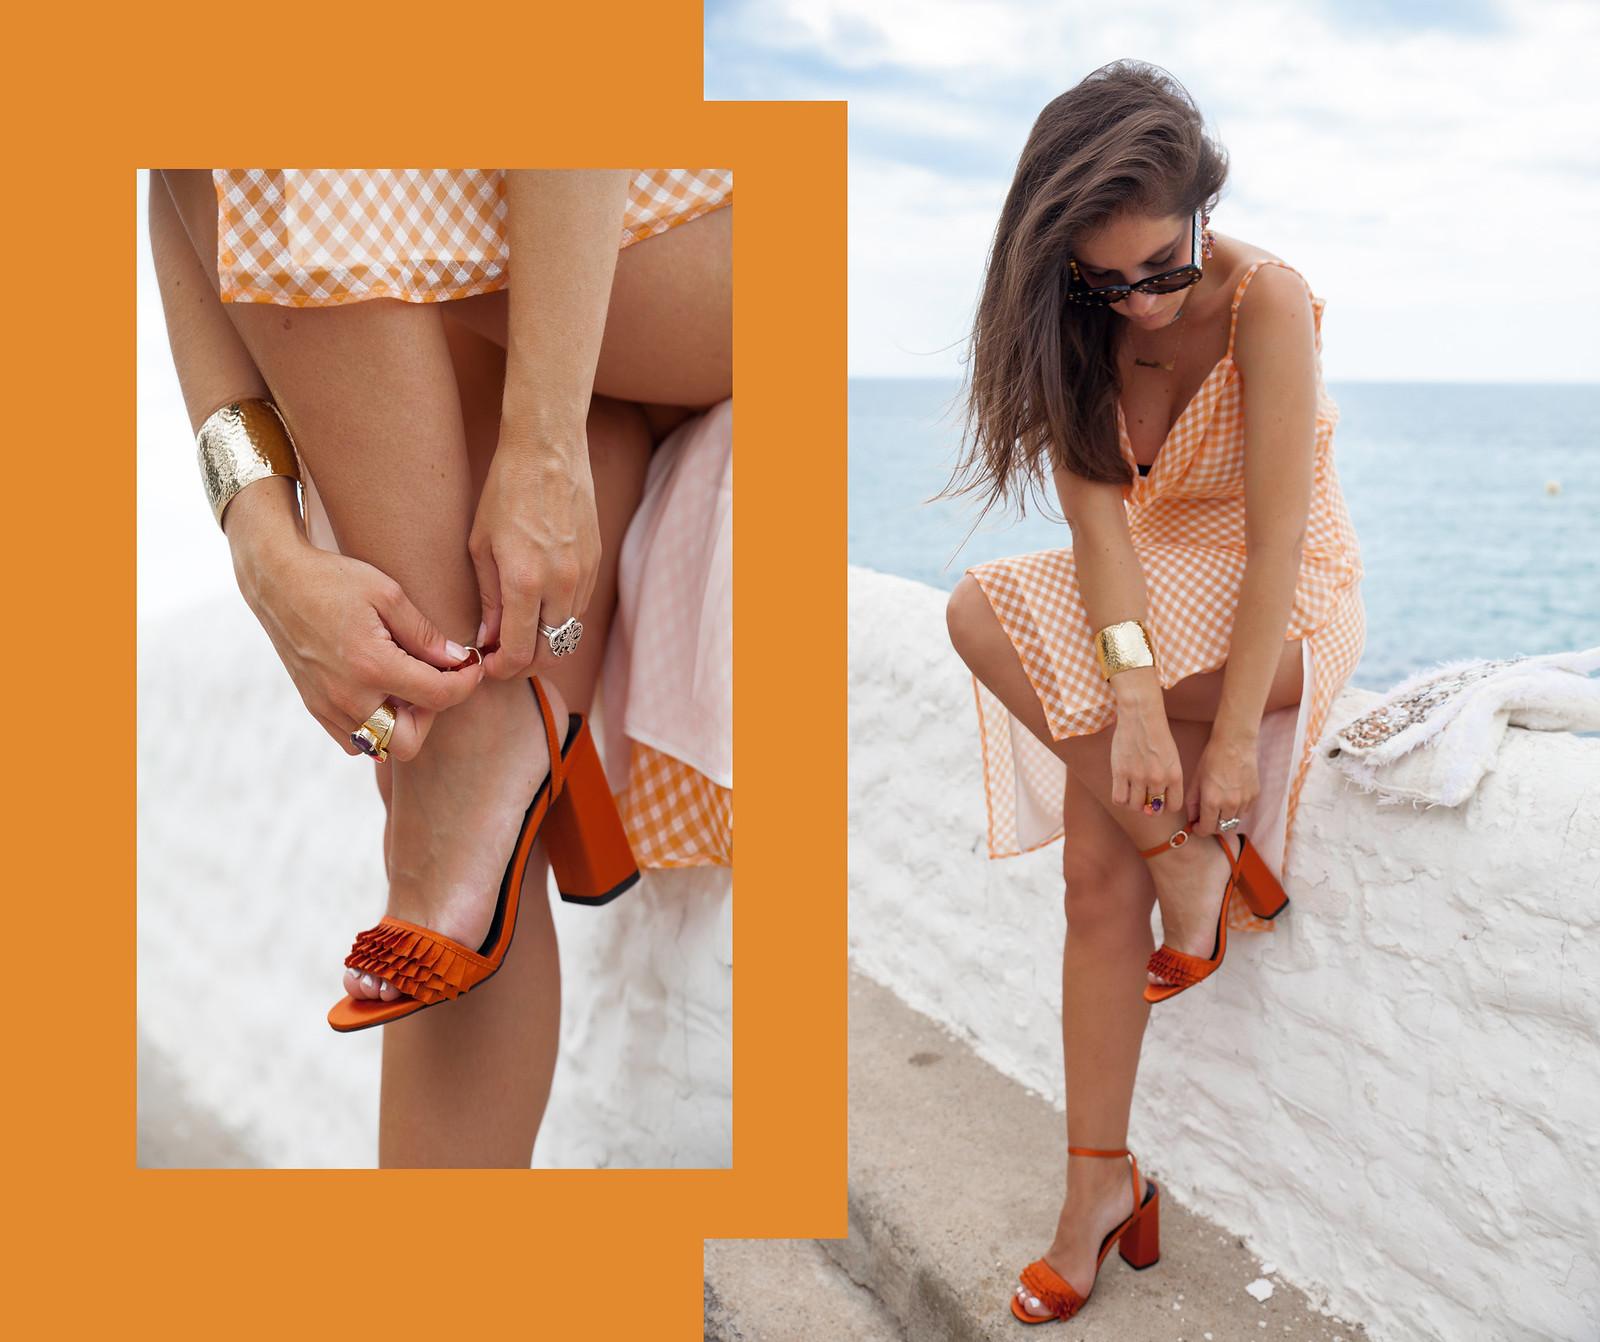 06_LPA_dress_revolve_ambassador_spain_influencer_theguestgirl_supremenyc_hypebae_laura_santolaria